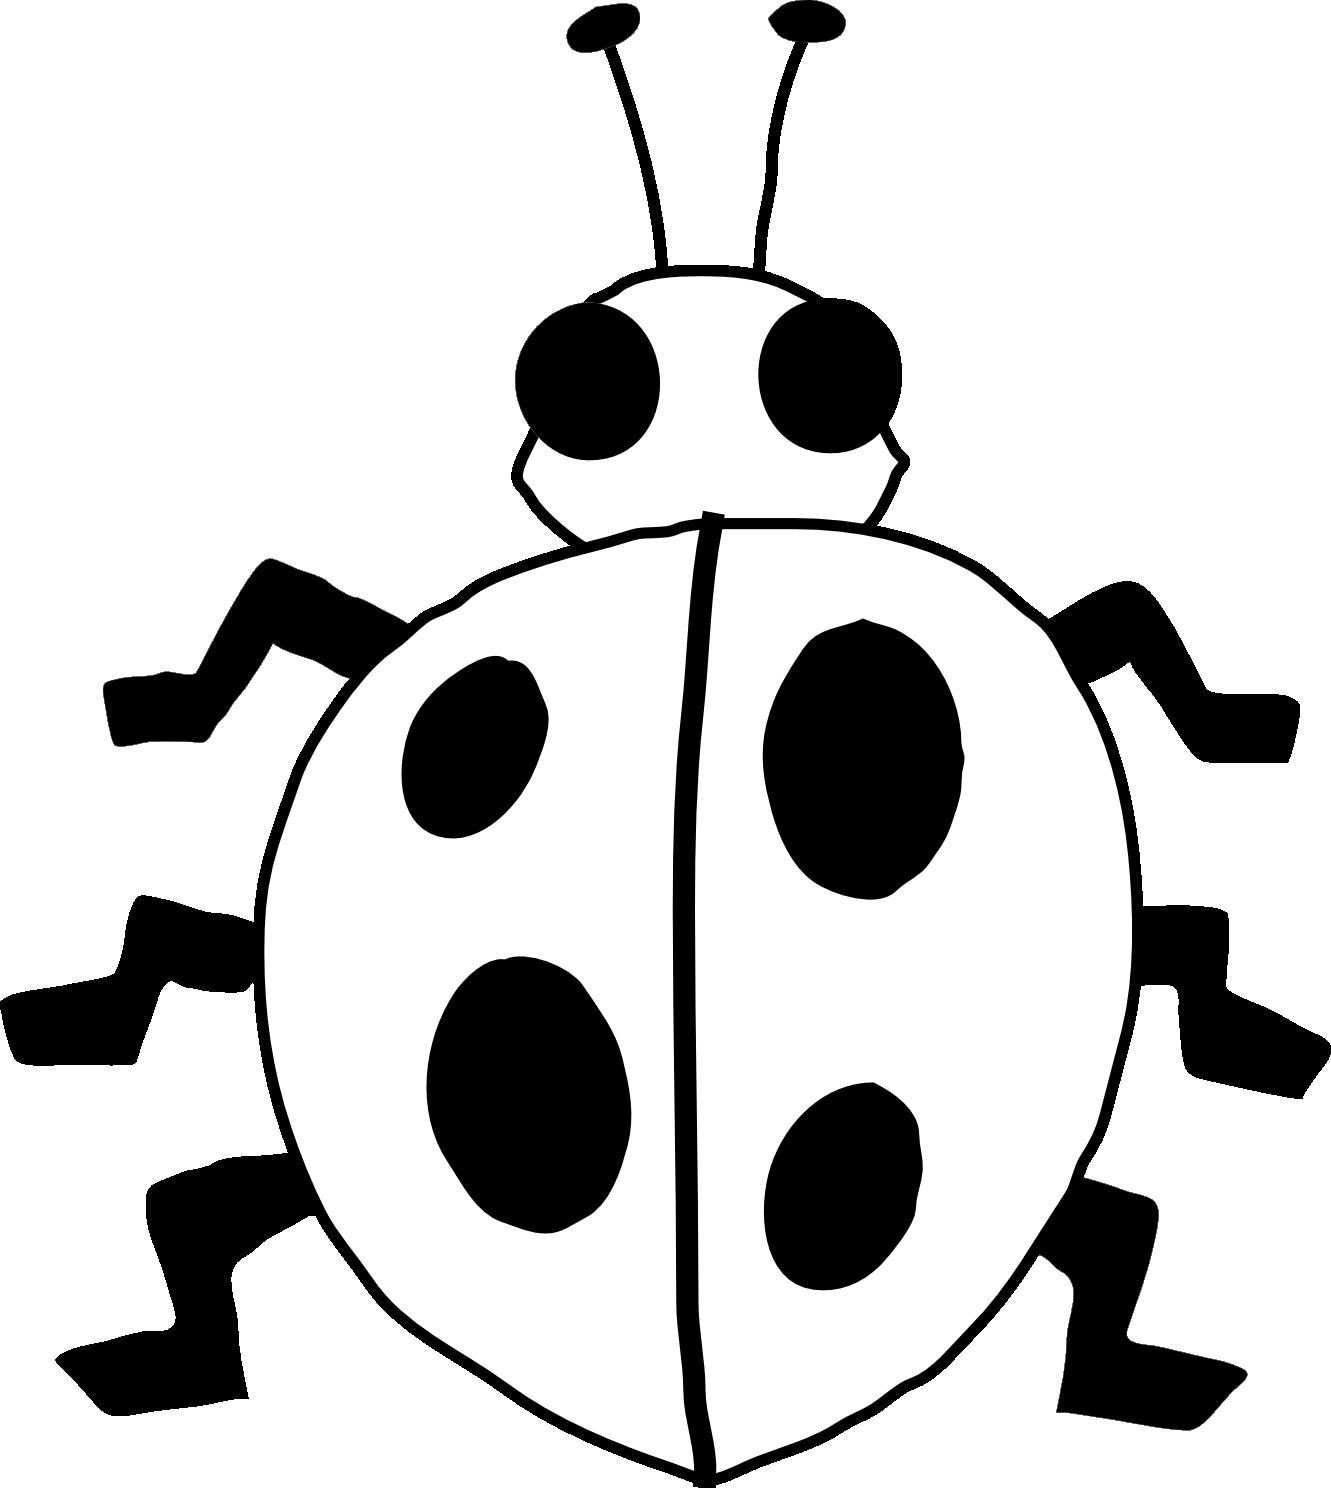 Clipart black and white flower svg download Clip Art Flower Black And White | Clipart Panda - Free Clipart Images svg download